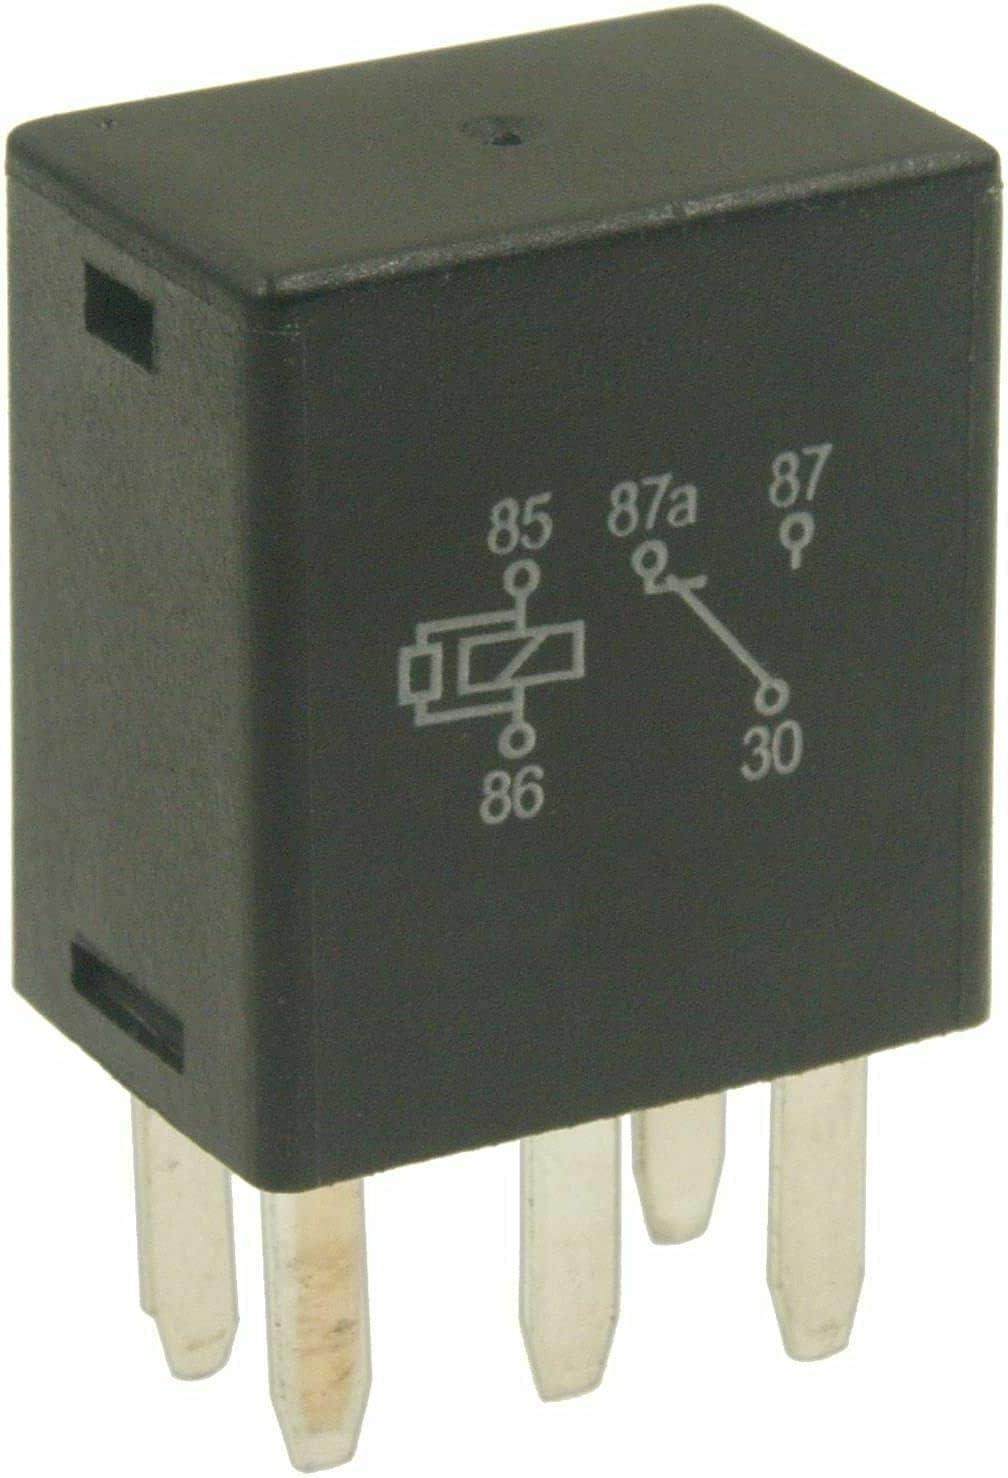 Replacement A service C Max 78% OFF Auto Relay Temperature Control